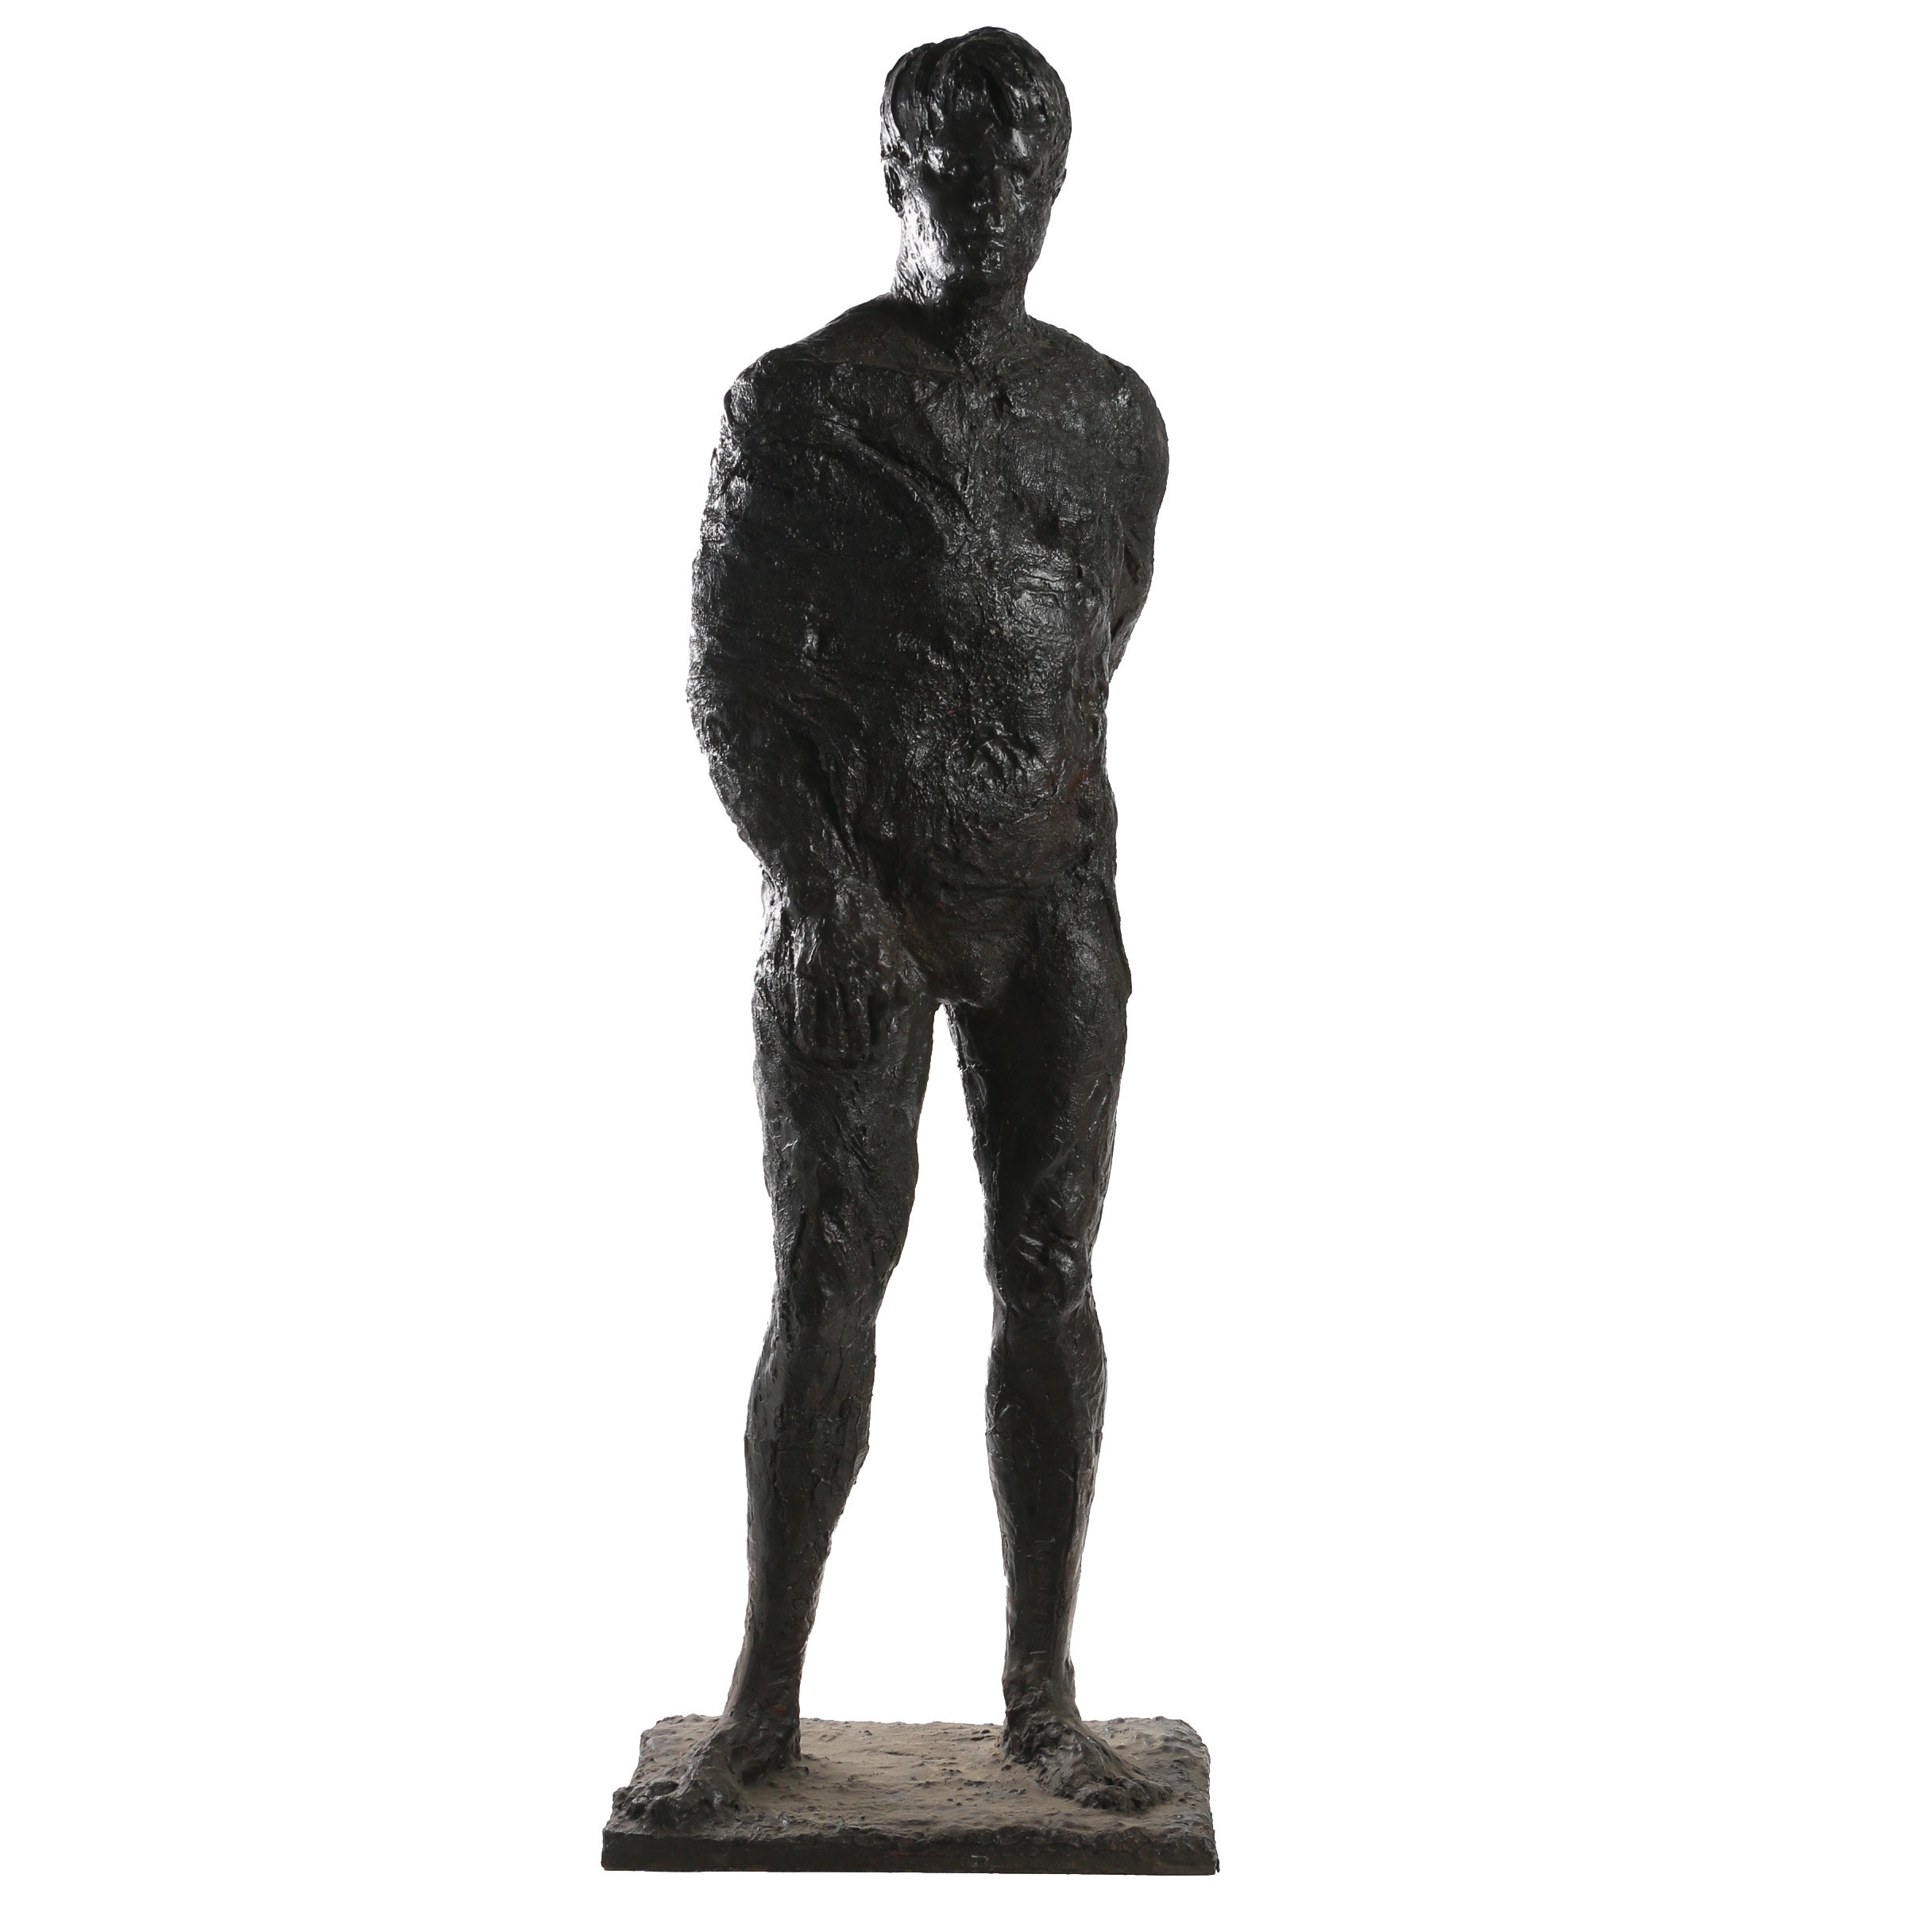 John Tuska Fiberglass Sculpture